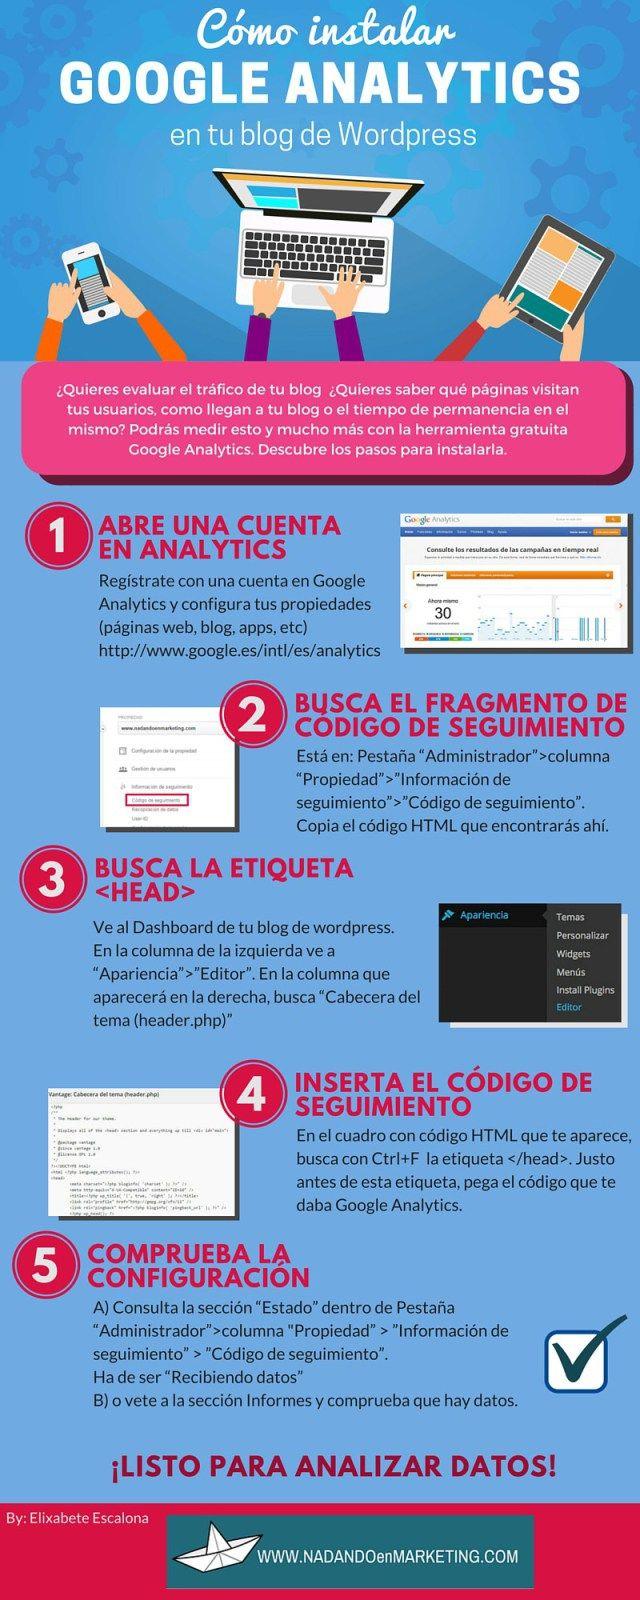 Cómo instalar Google Analytics en tu blog WordPress